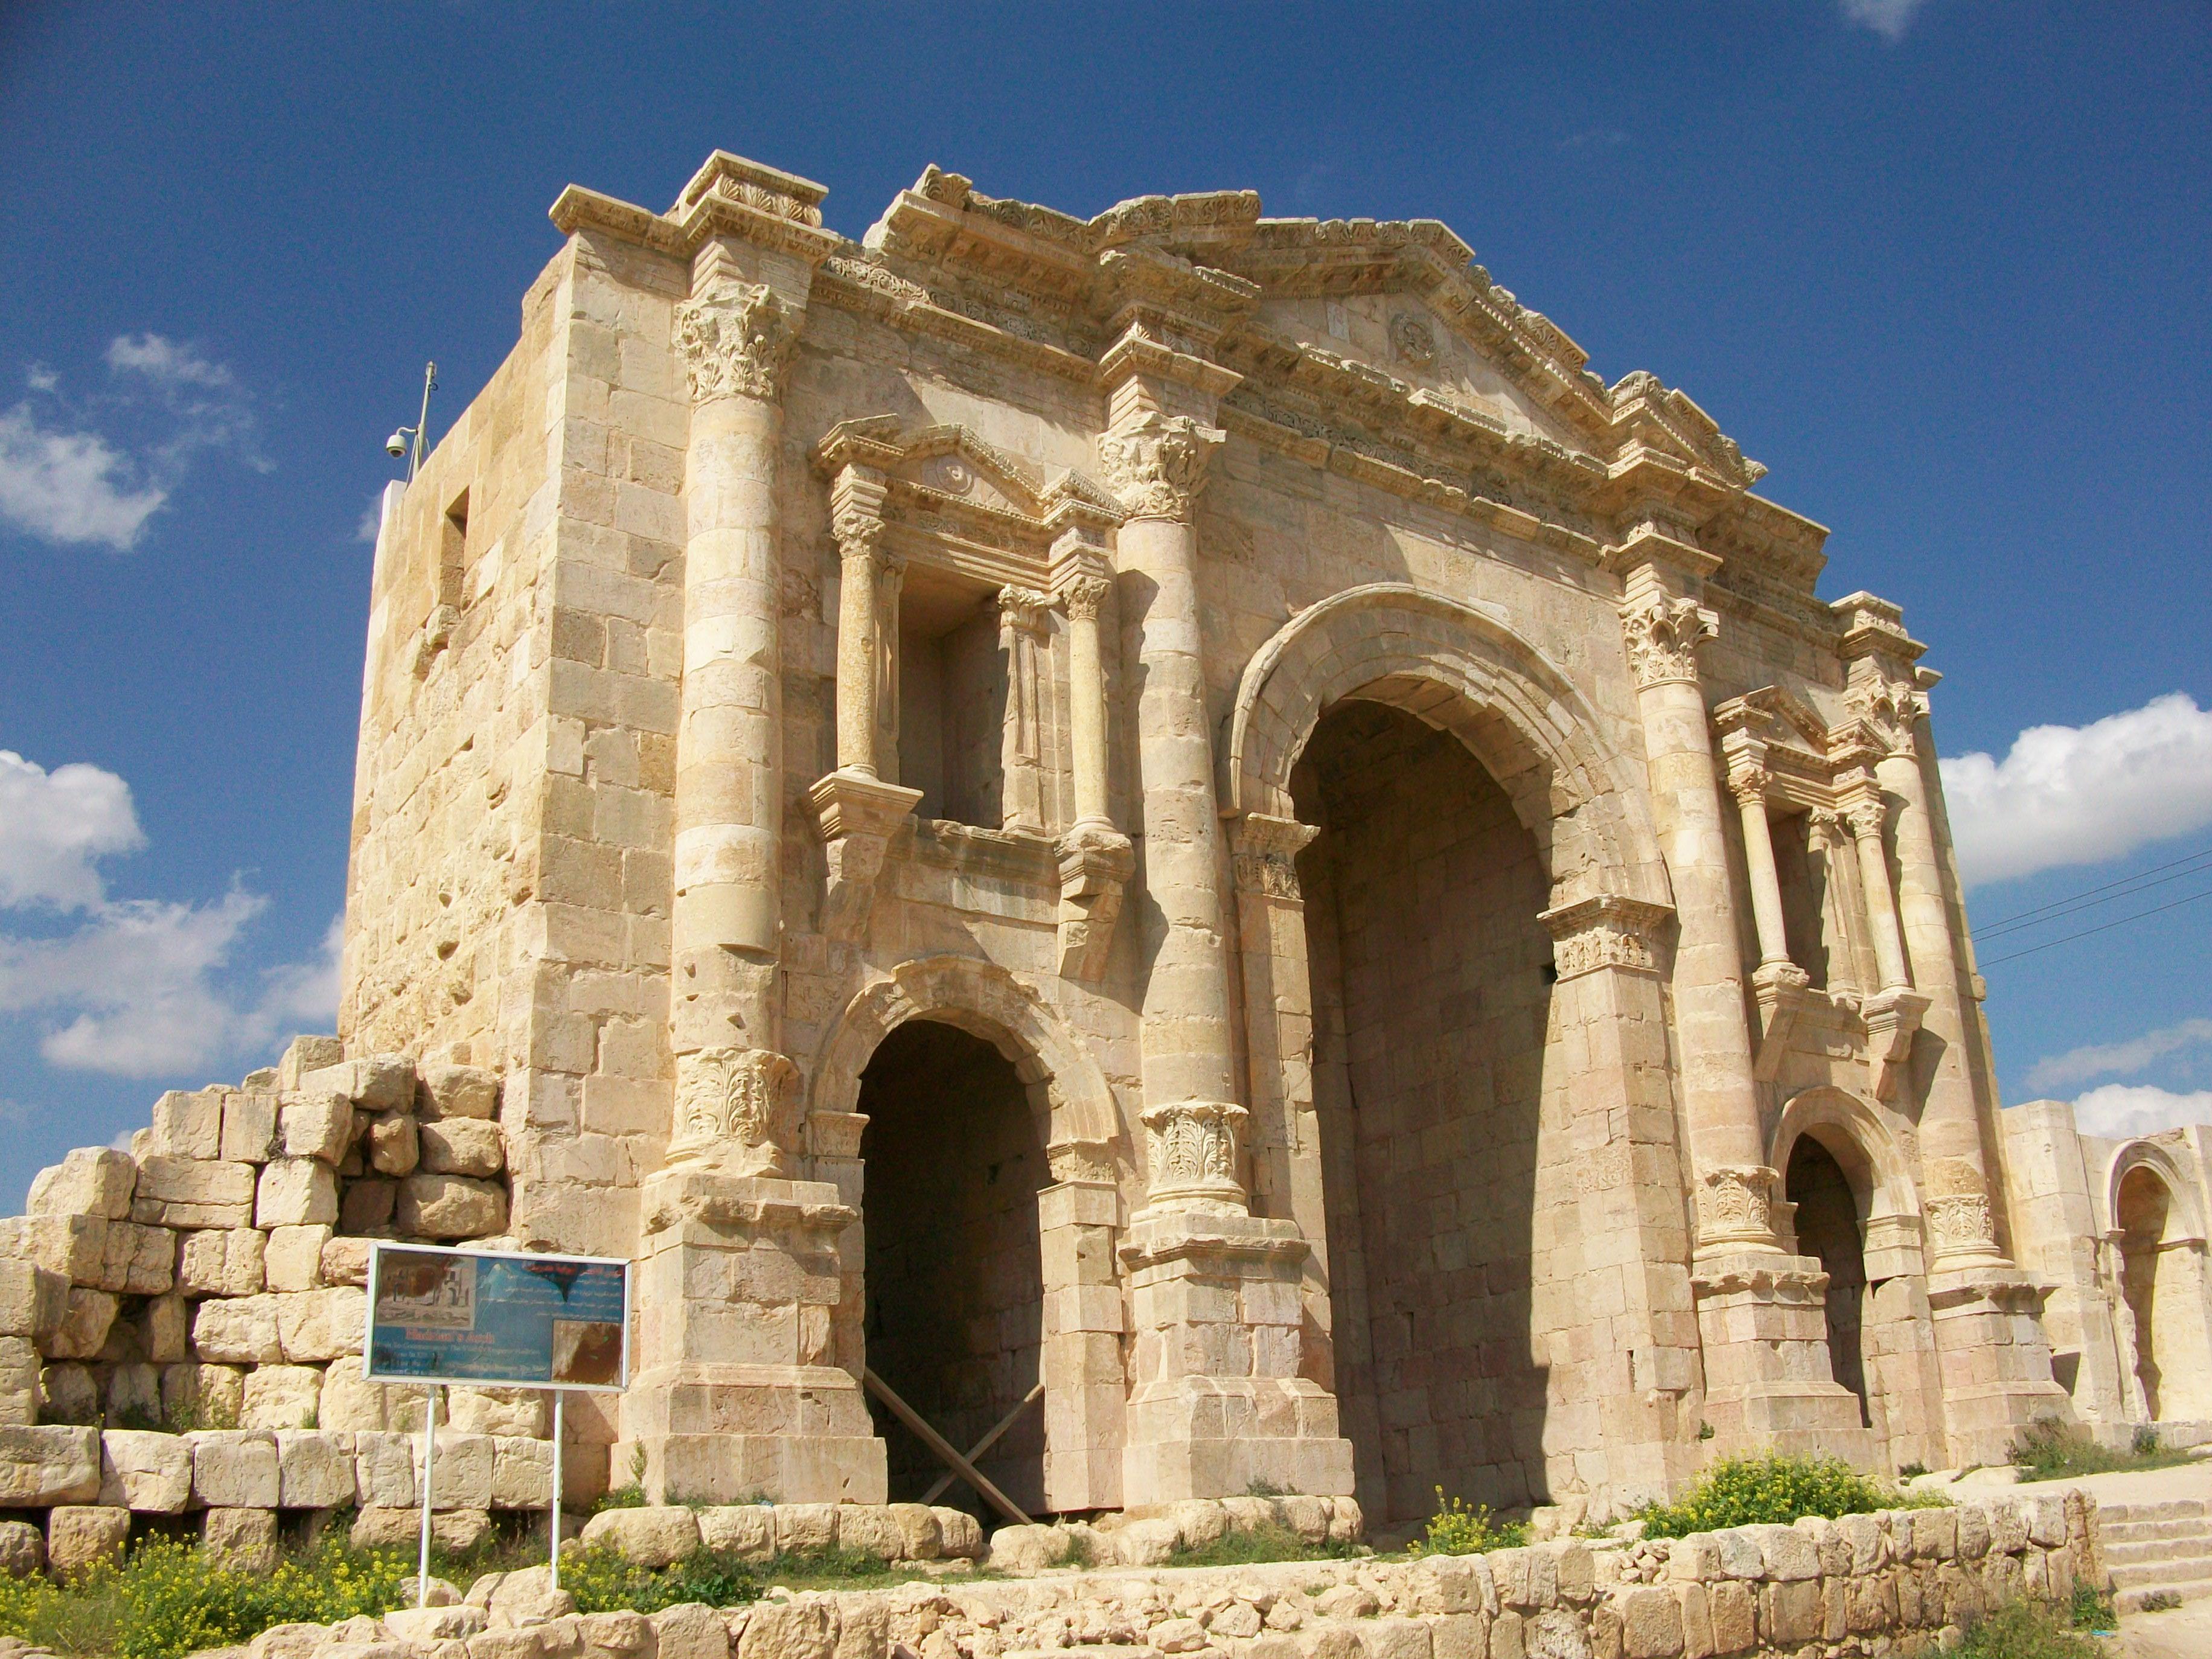 File:Hadrians Arch, Jerash, 2009.jpg - Wikimedia Commons